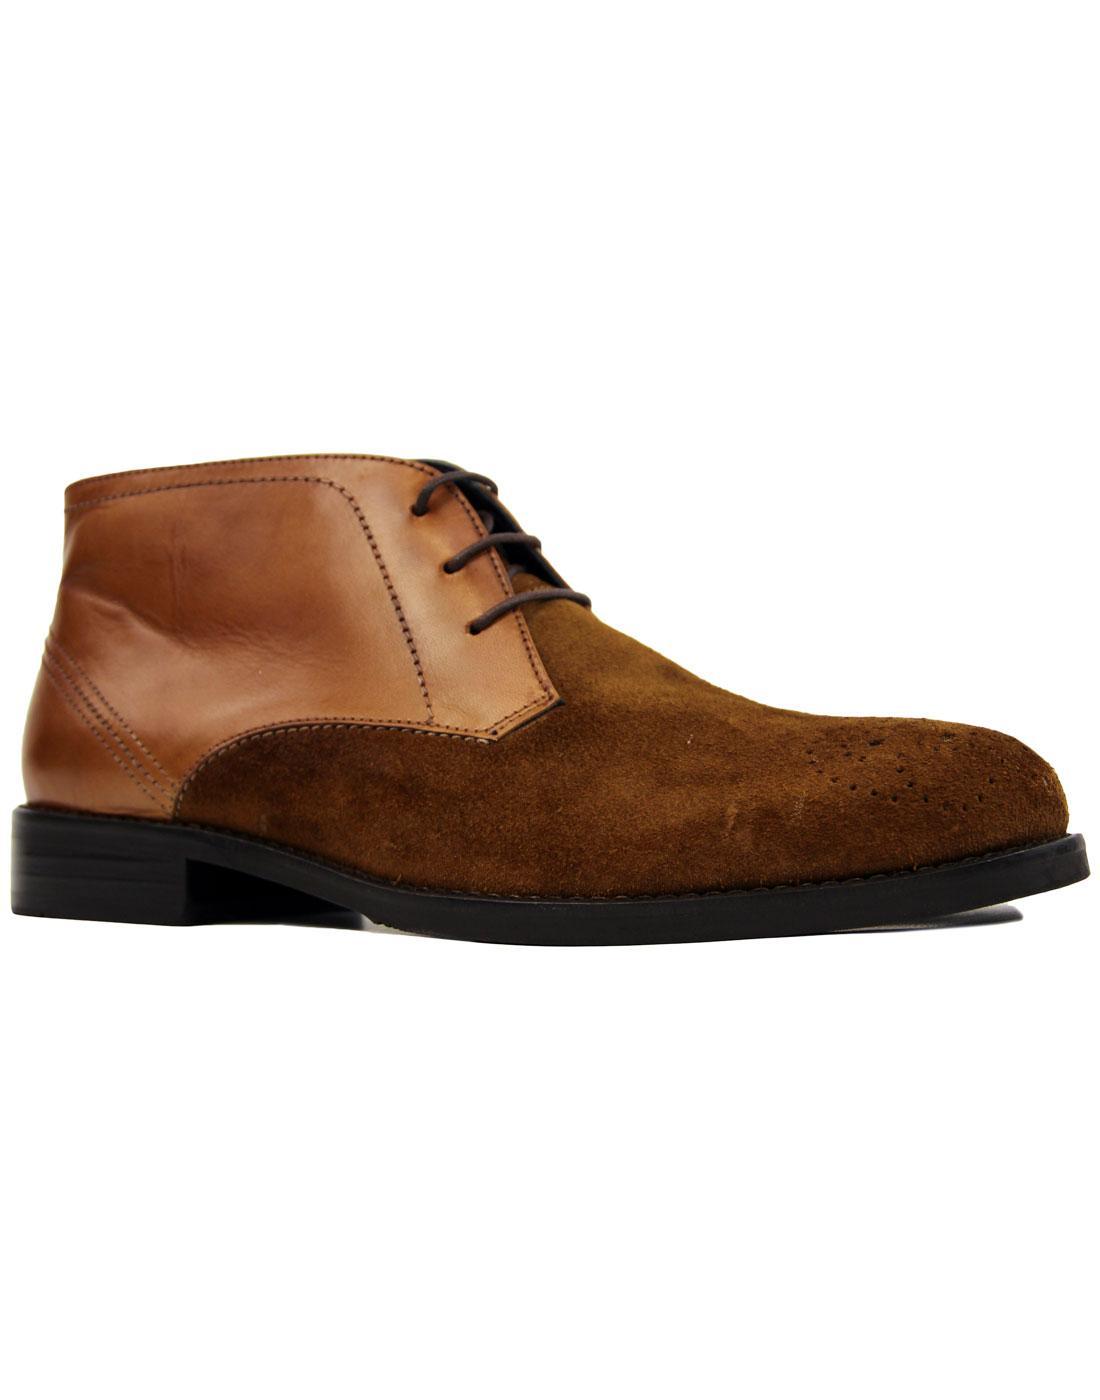 Sorley PAOLO VANDINI 60s Mod Brogue Desert Boots T